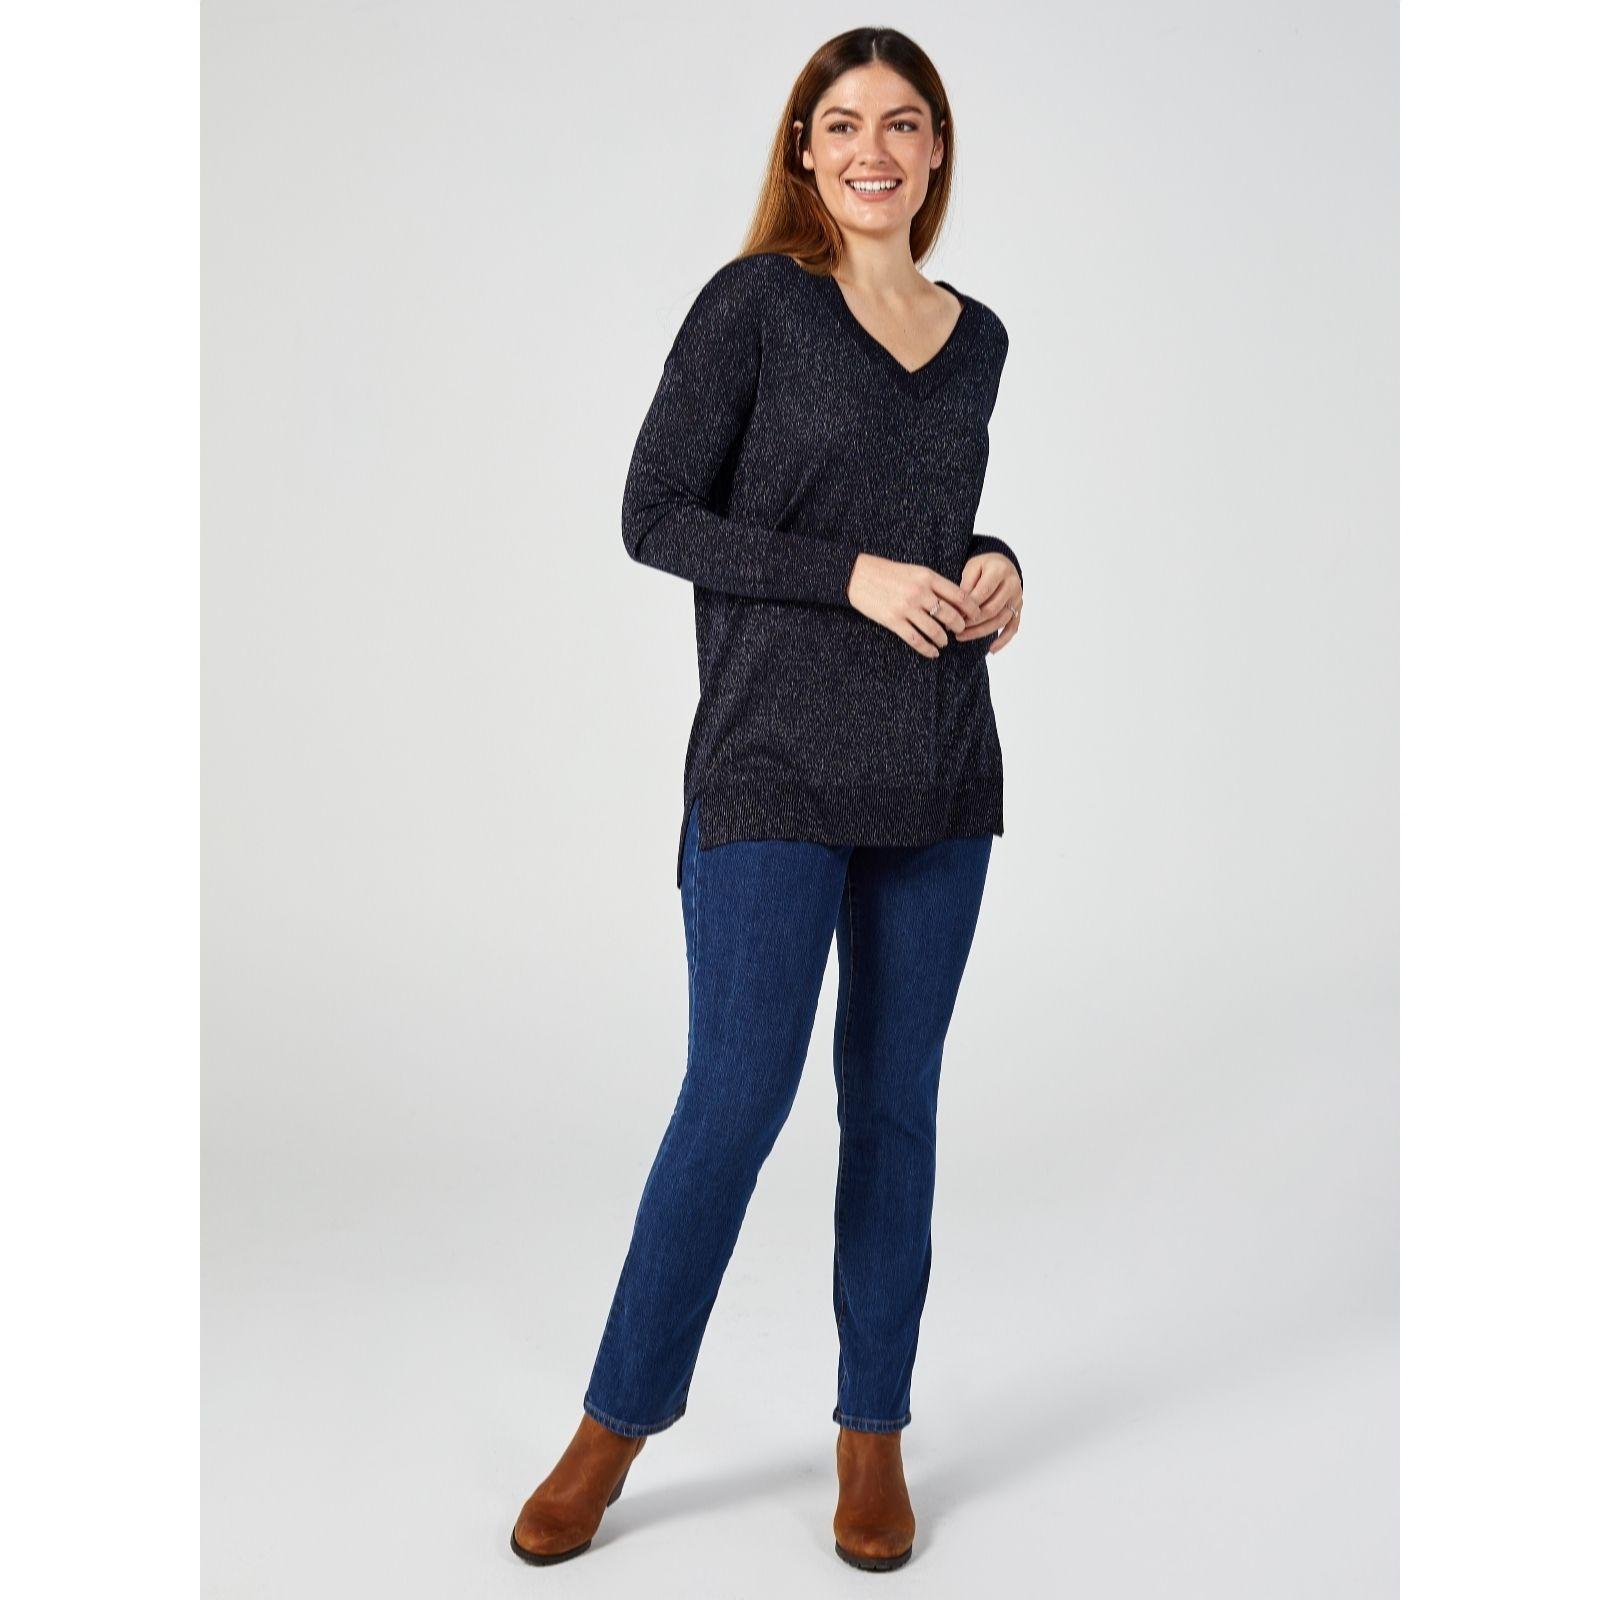 af4cc5e588 Ruth Langsford New Fit Straight Leg Jeans Petite - QVC UK